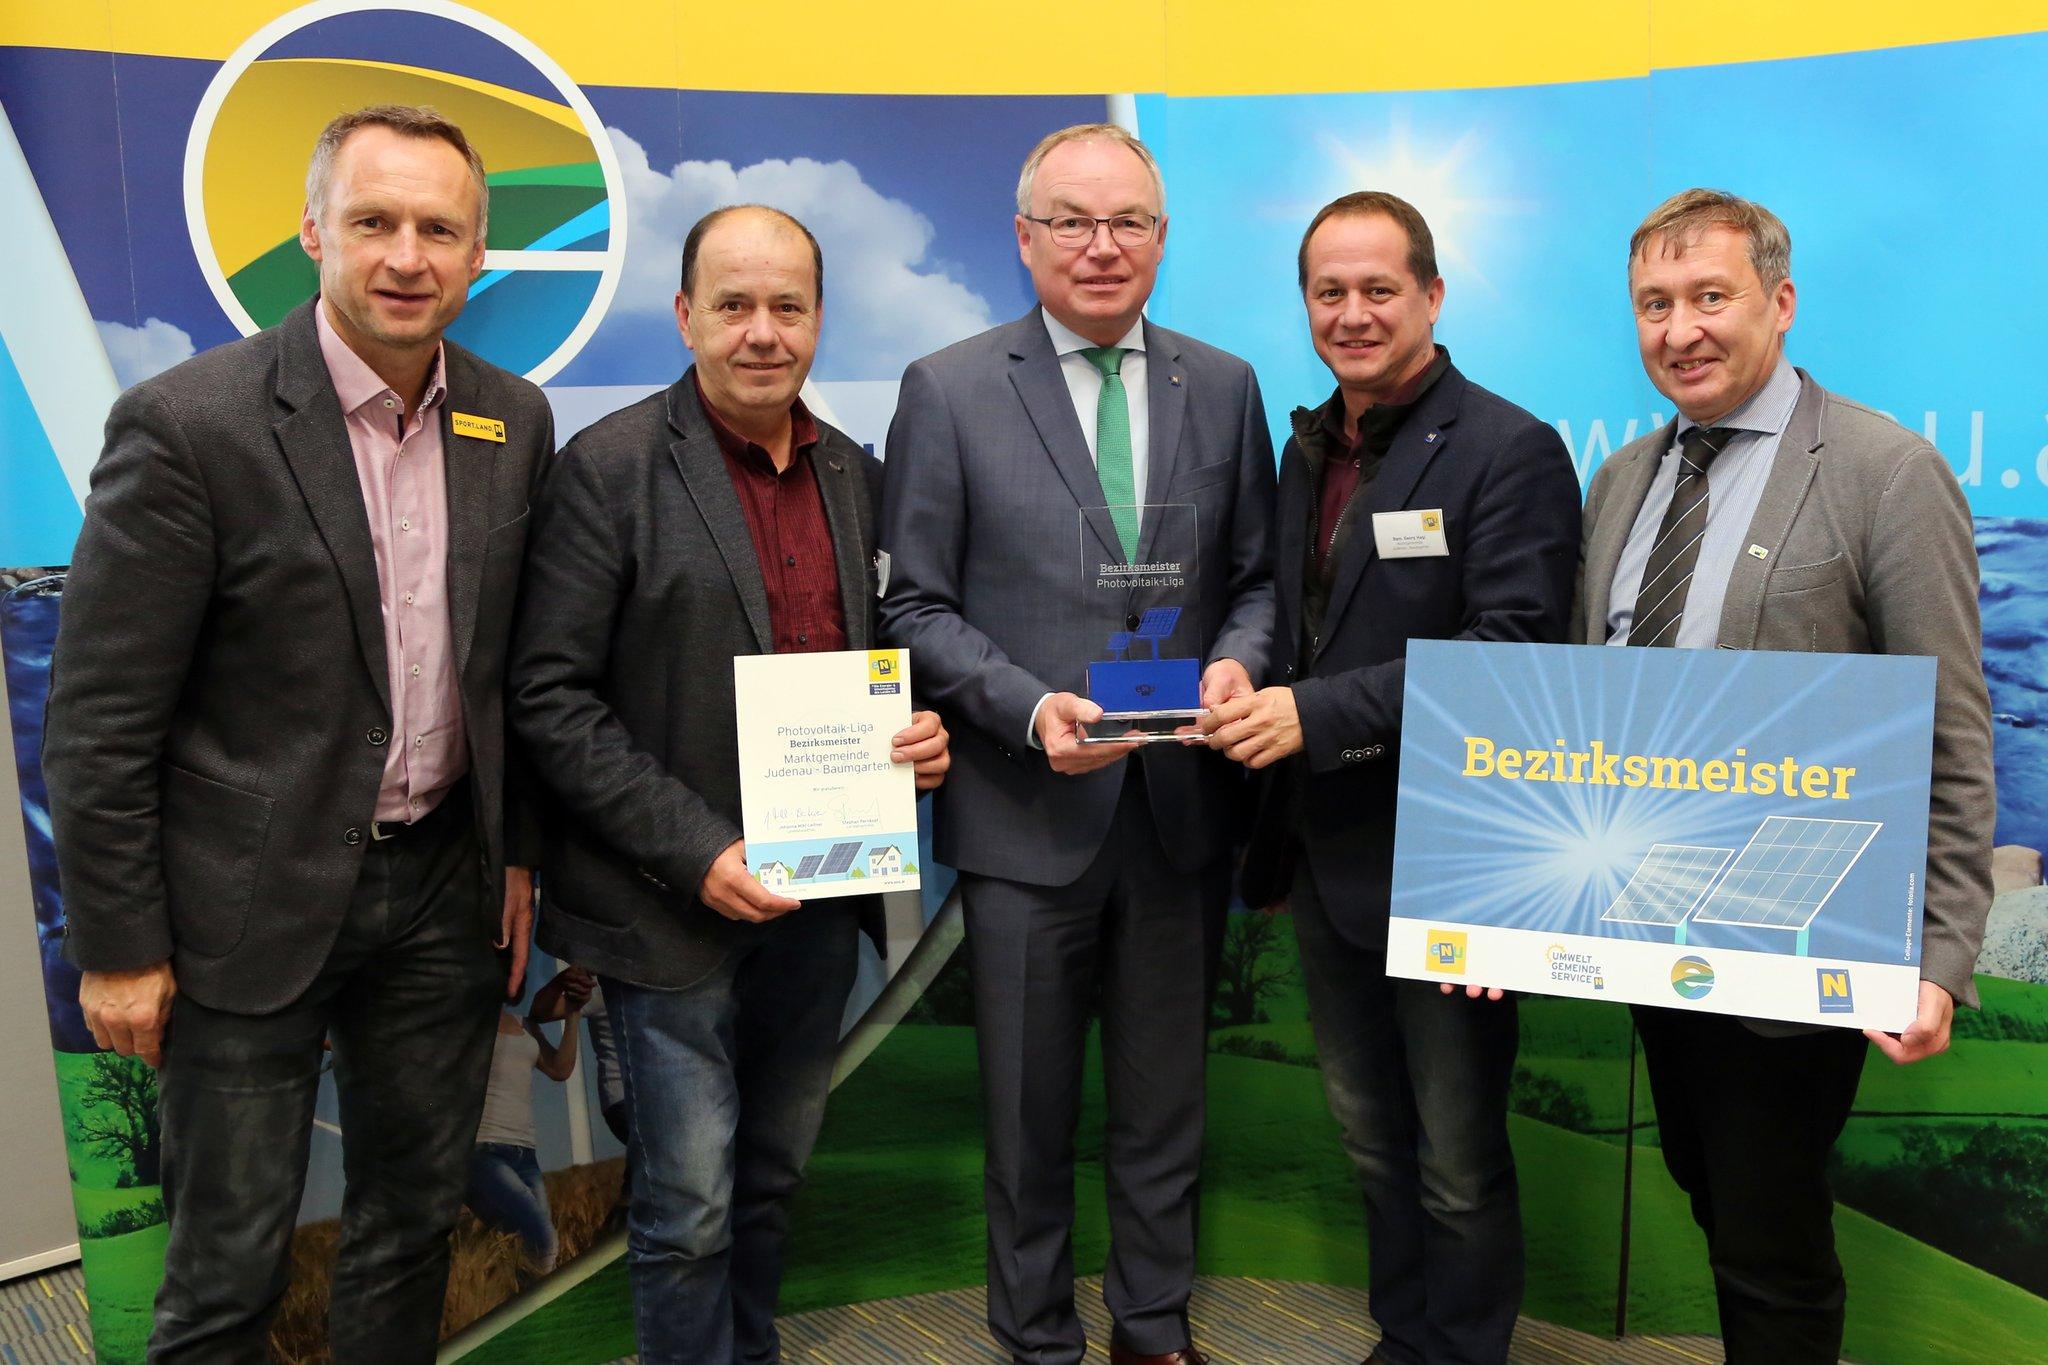 Partnervermittlung aus grnburg, Judenau-baumgarten kurse fr